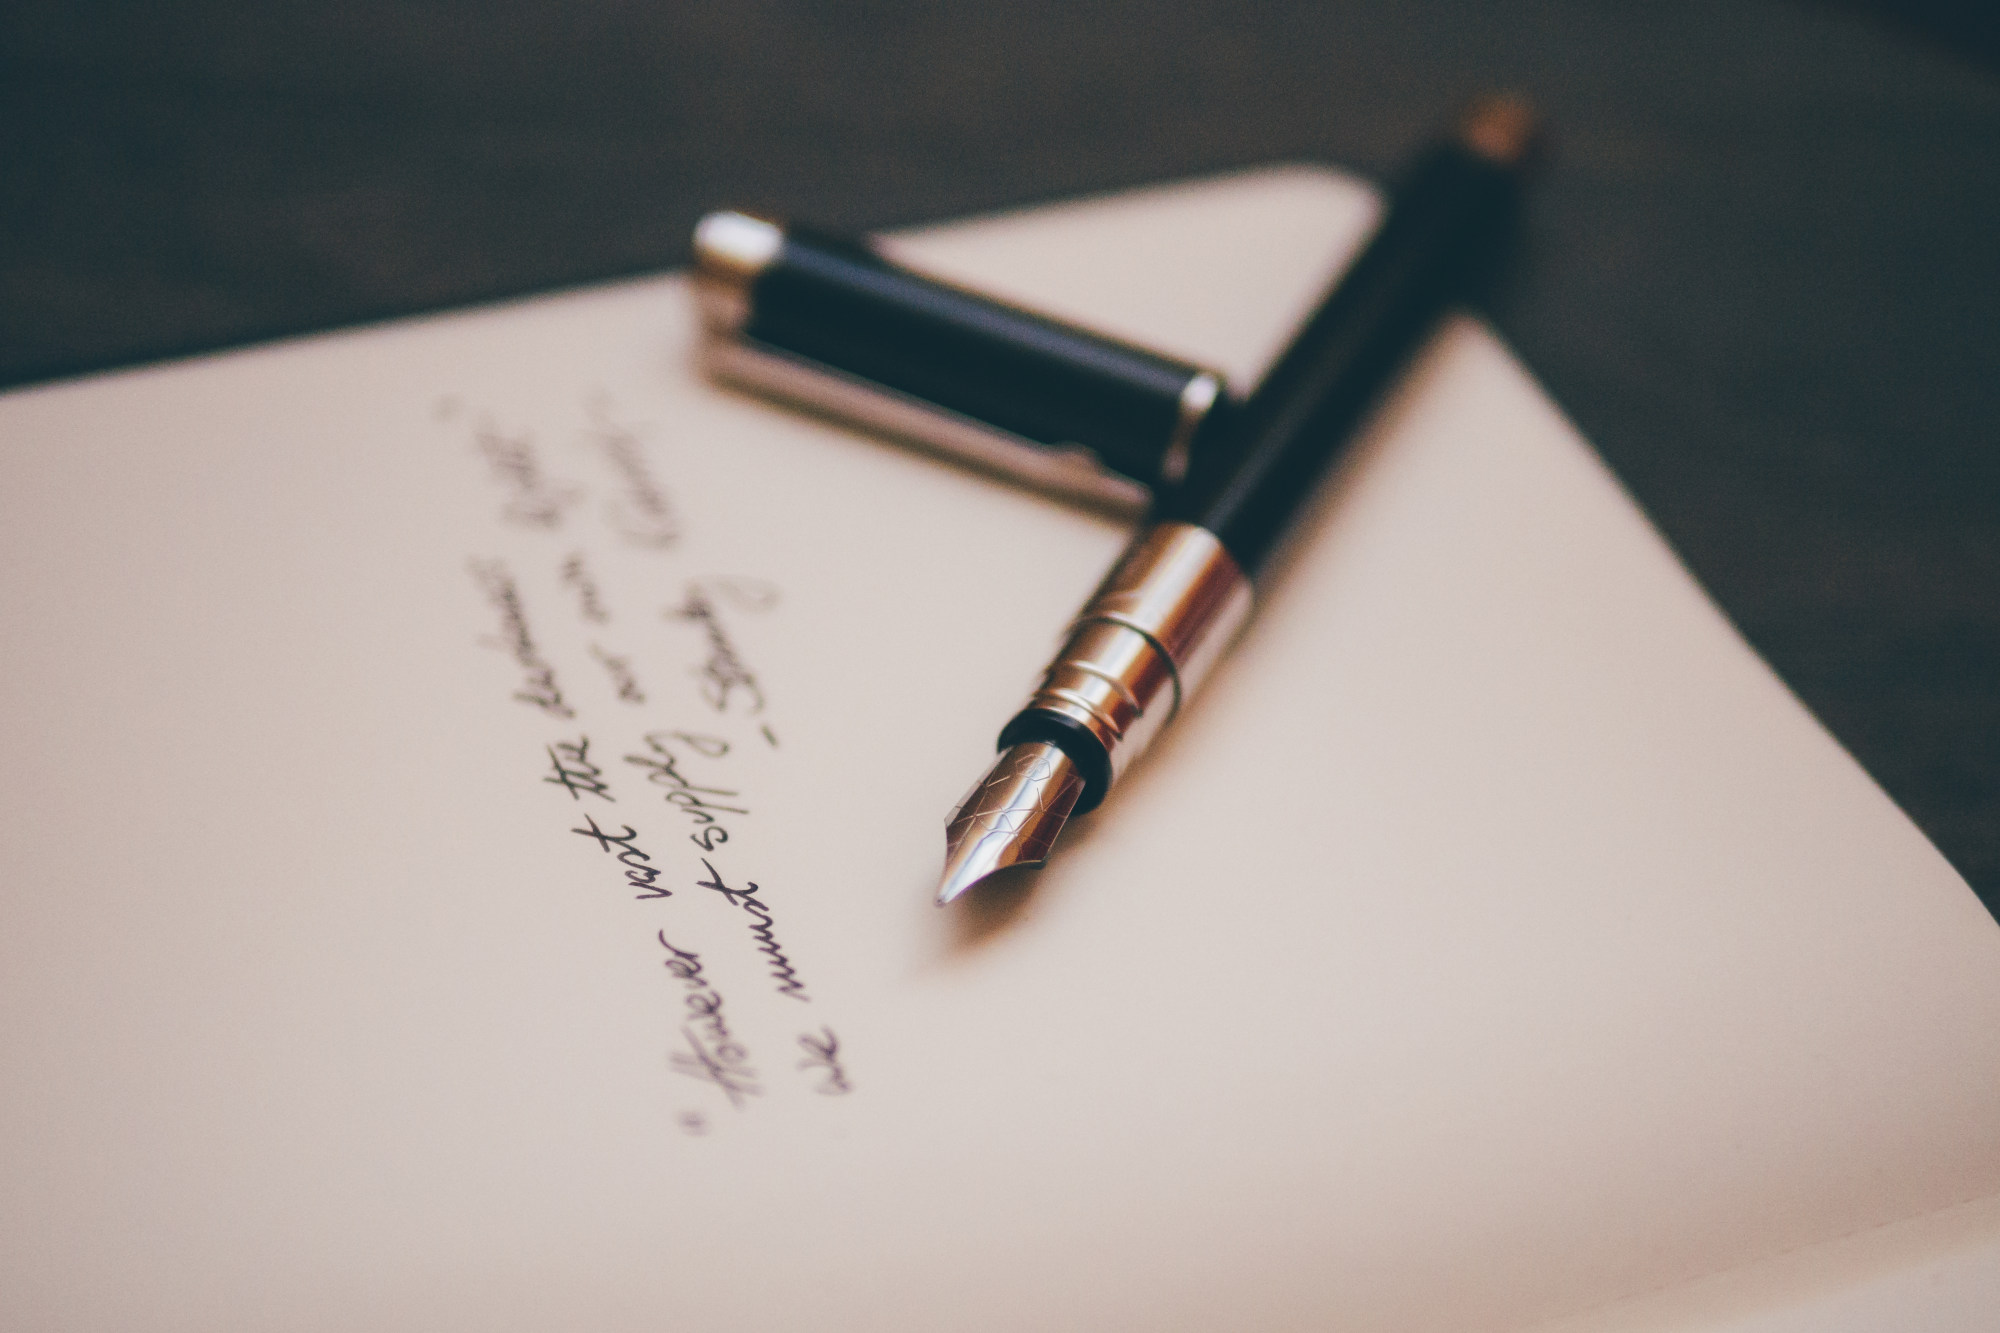 Writer's journey